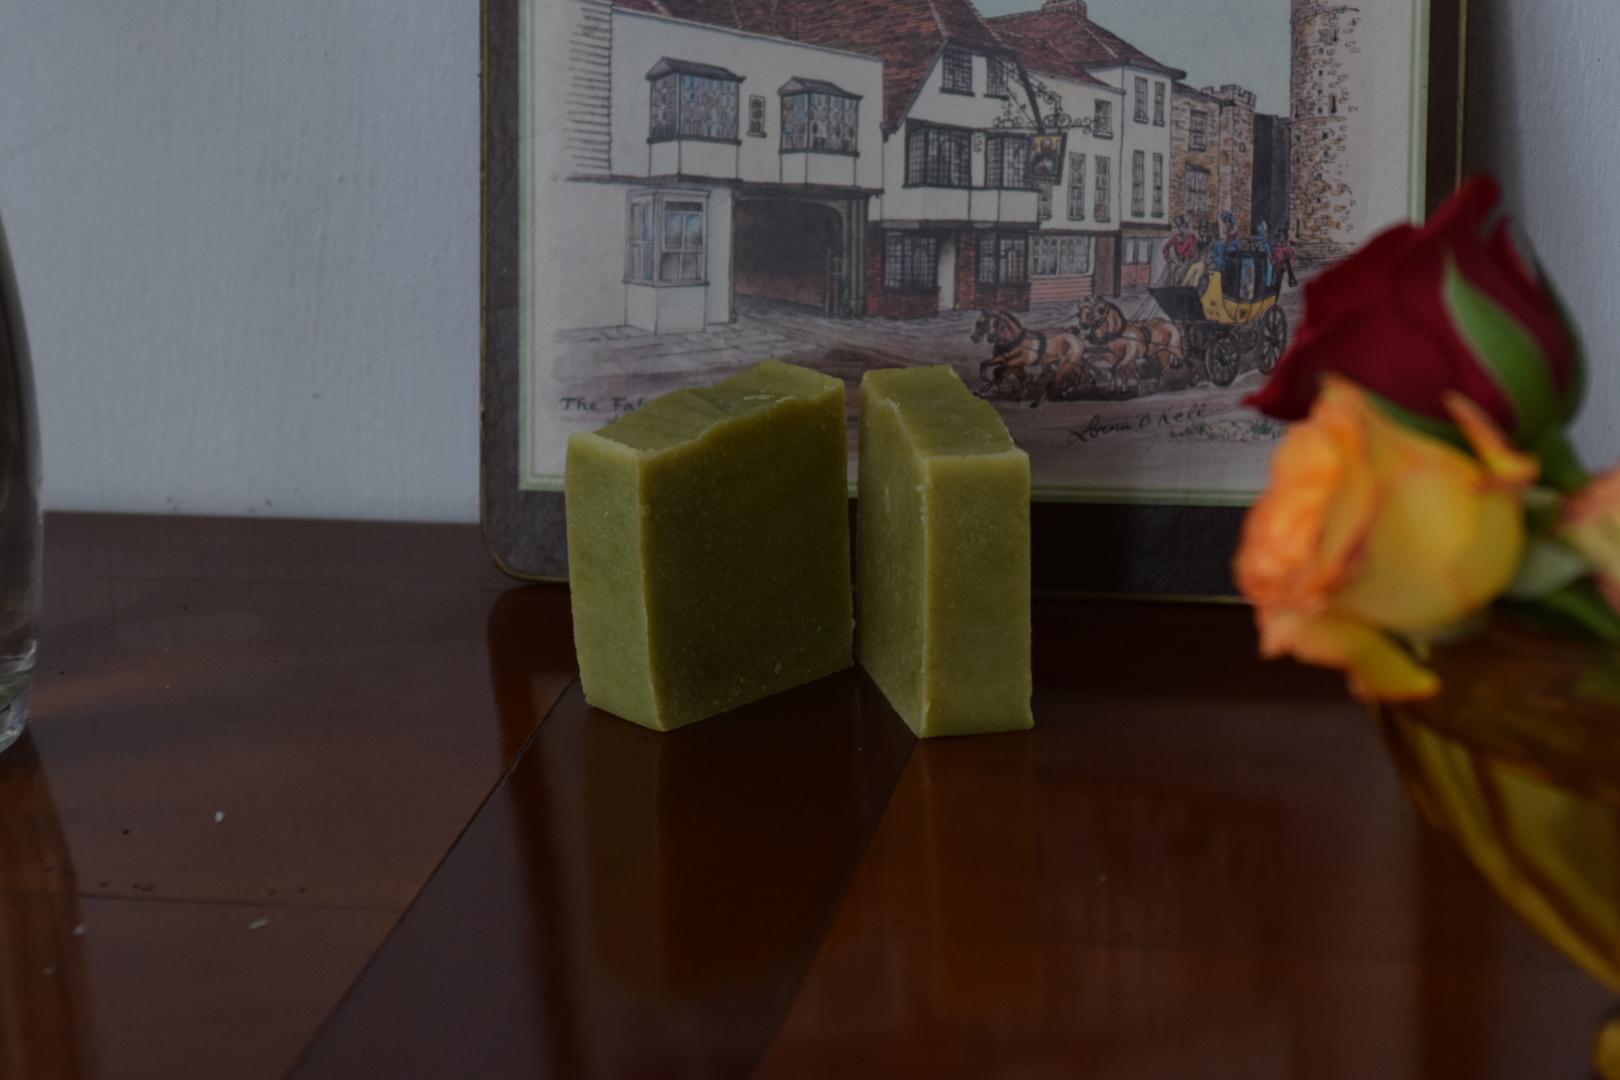 wheatgrass aromatherapy soap herbal painkiller artisanal